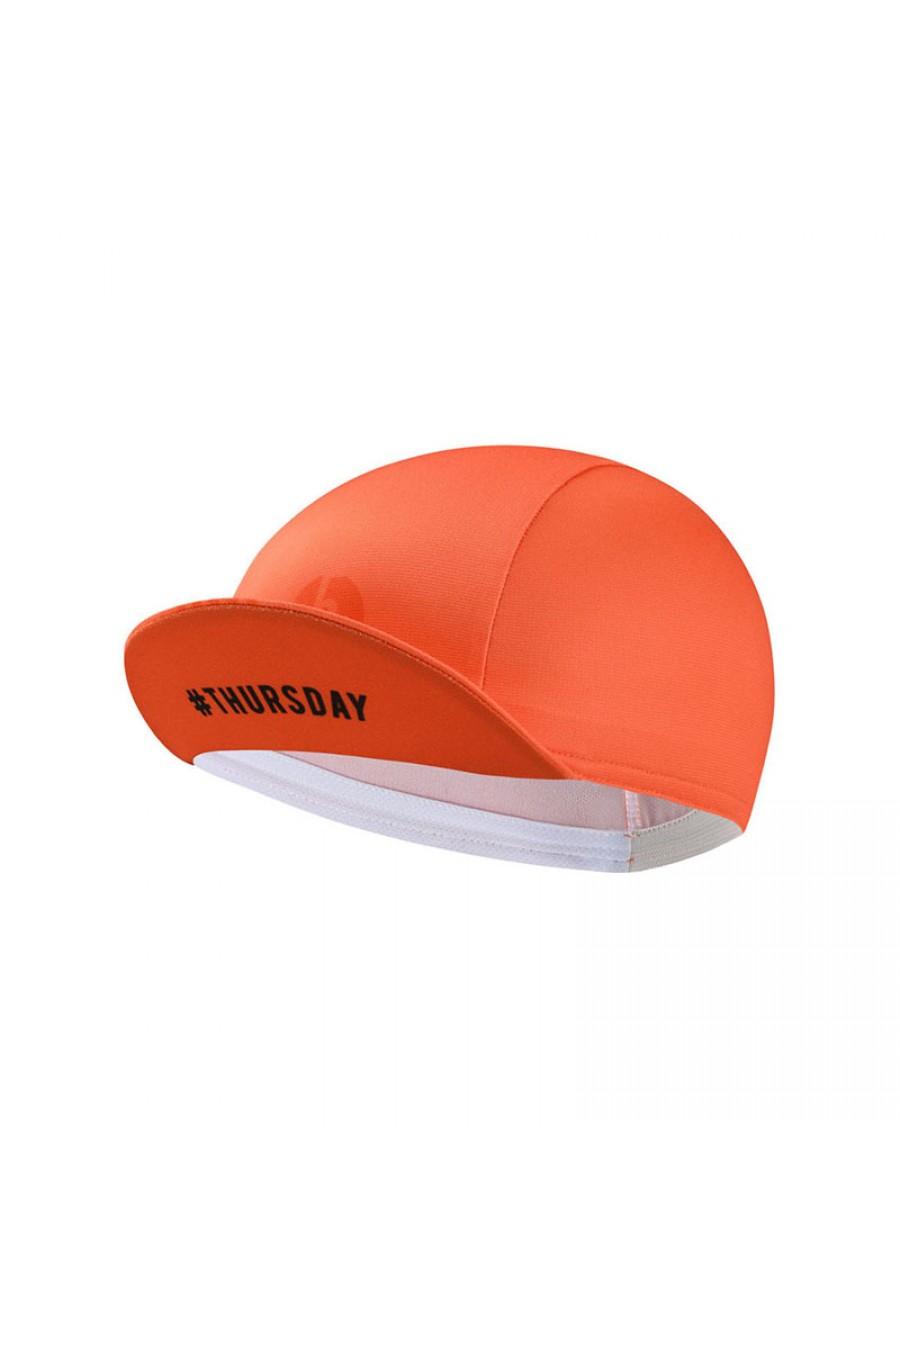 Unique Orange Cycling Caps Under Helmet